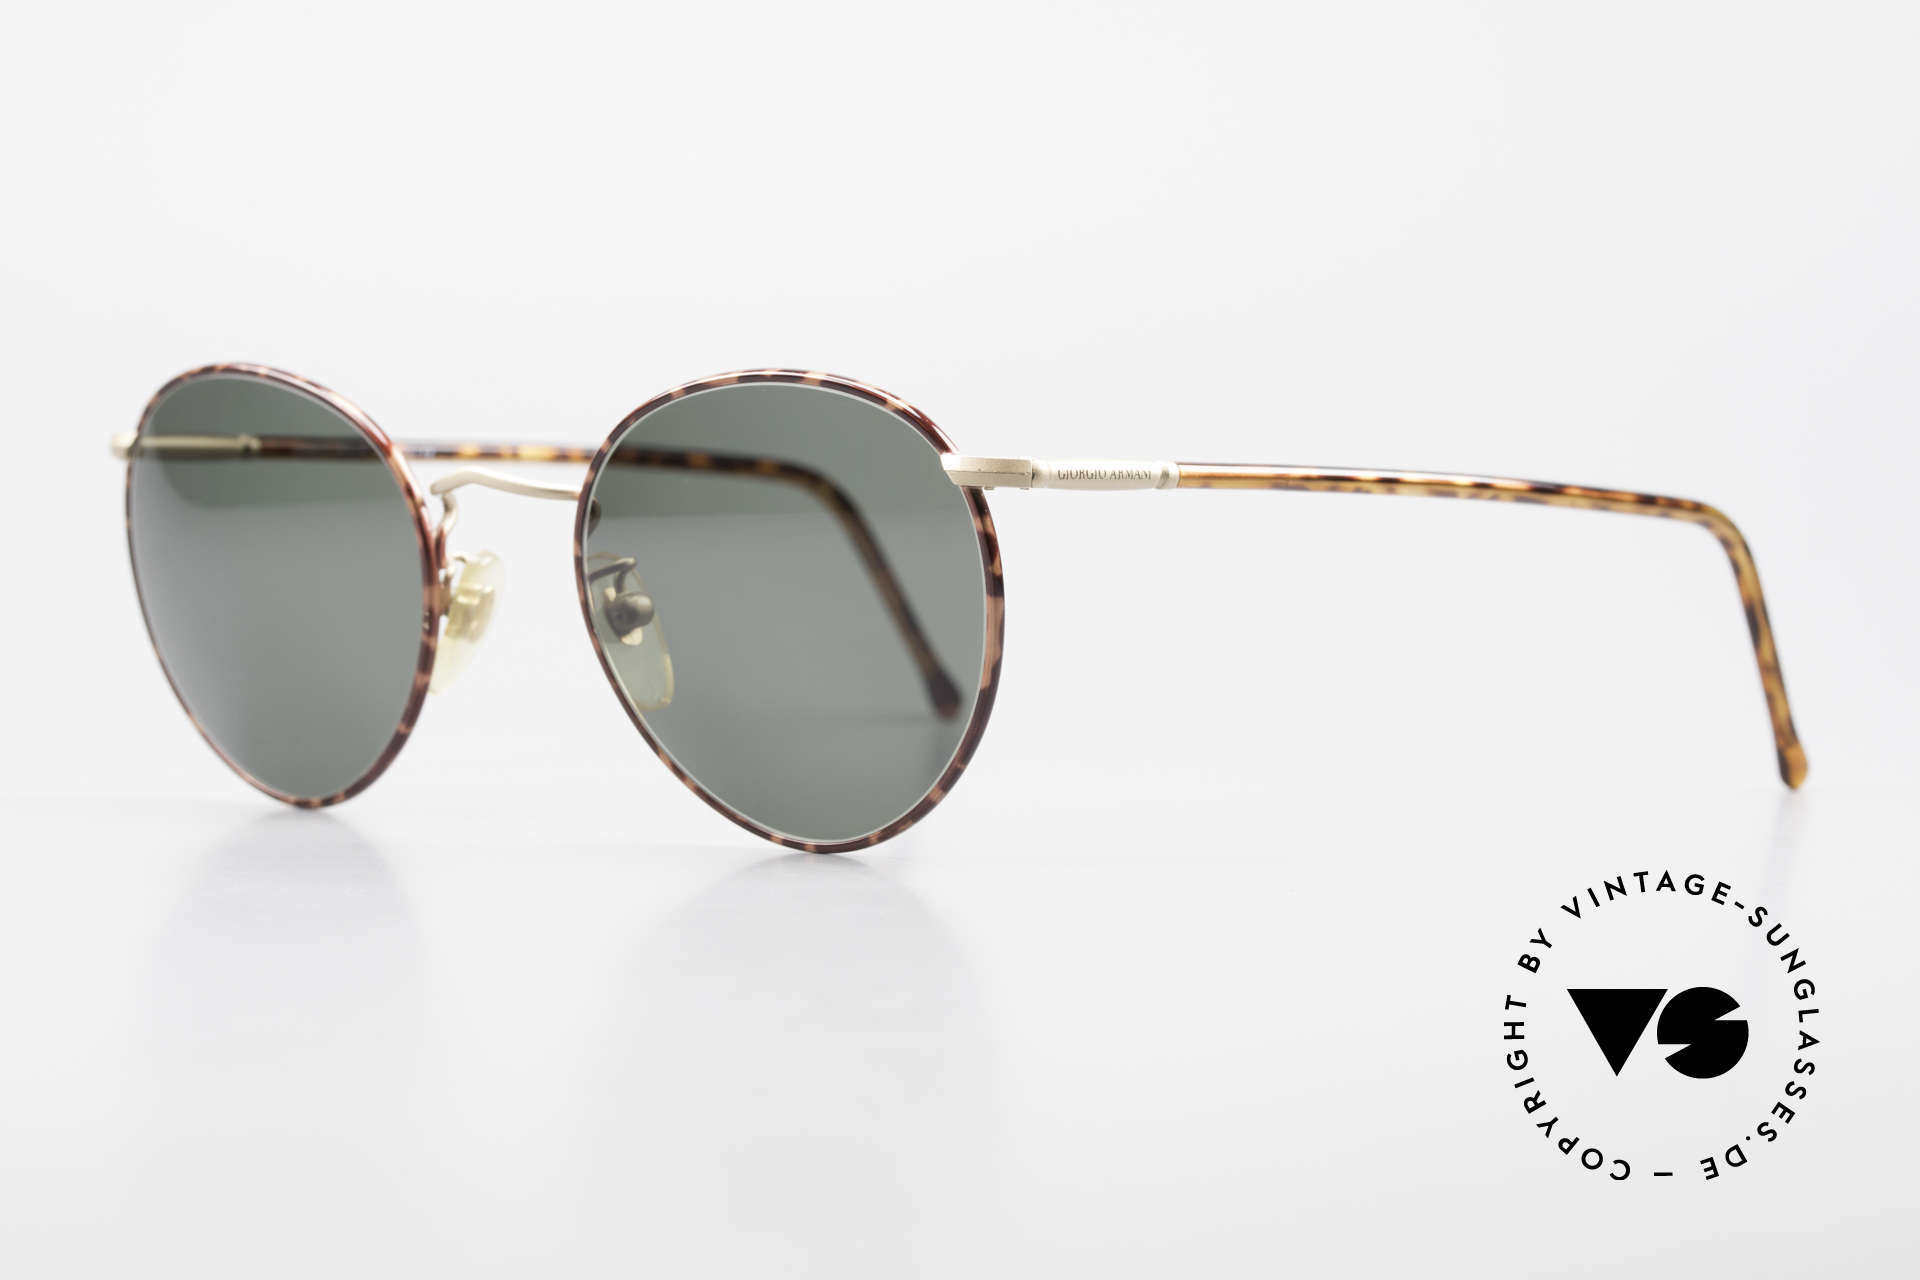 Giorgio Armani 186 No Retro Sunglasses Original, true 'gentlemen glasses' in tangible premium-quality, Made for Men